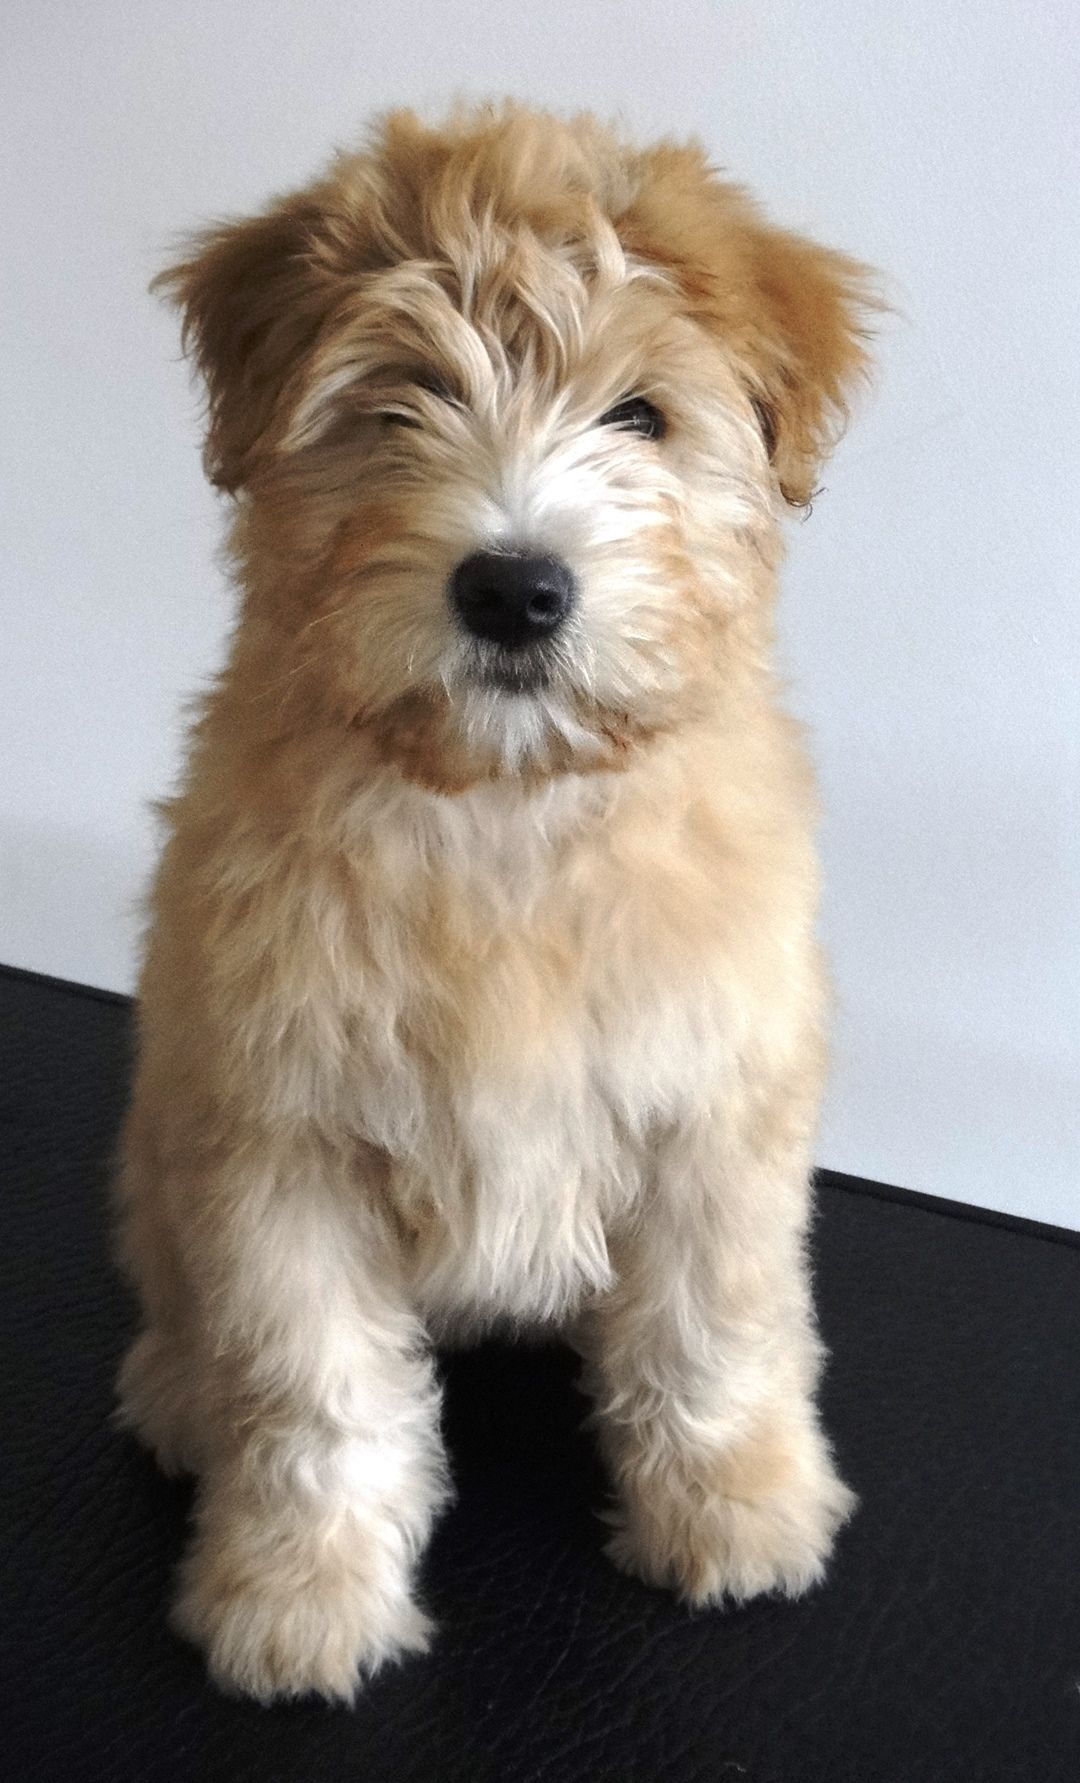 Winnie The Wheaten Terrier Her First Bath At 3 Months Old Wheaten Terrier Puppy Cute Dogs Cute Animals